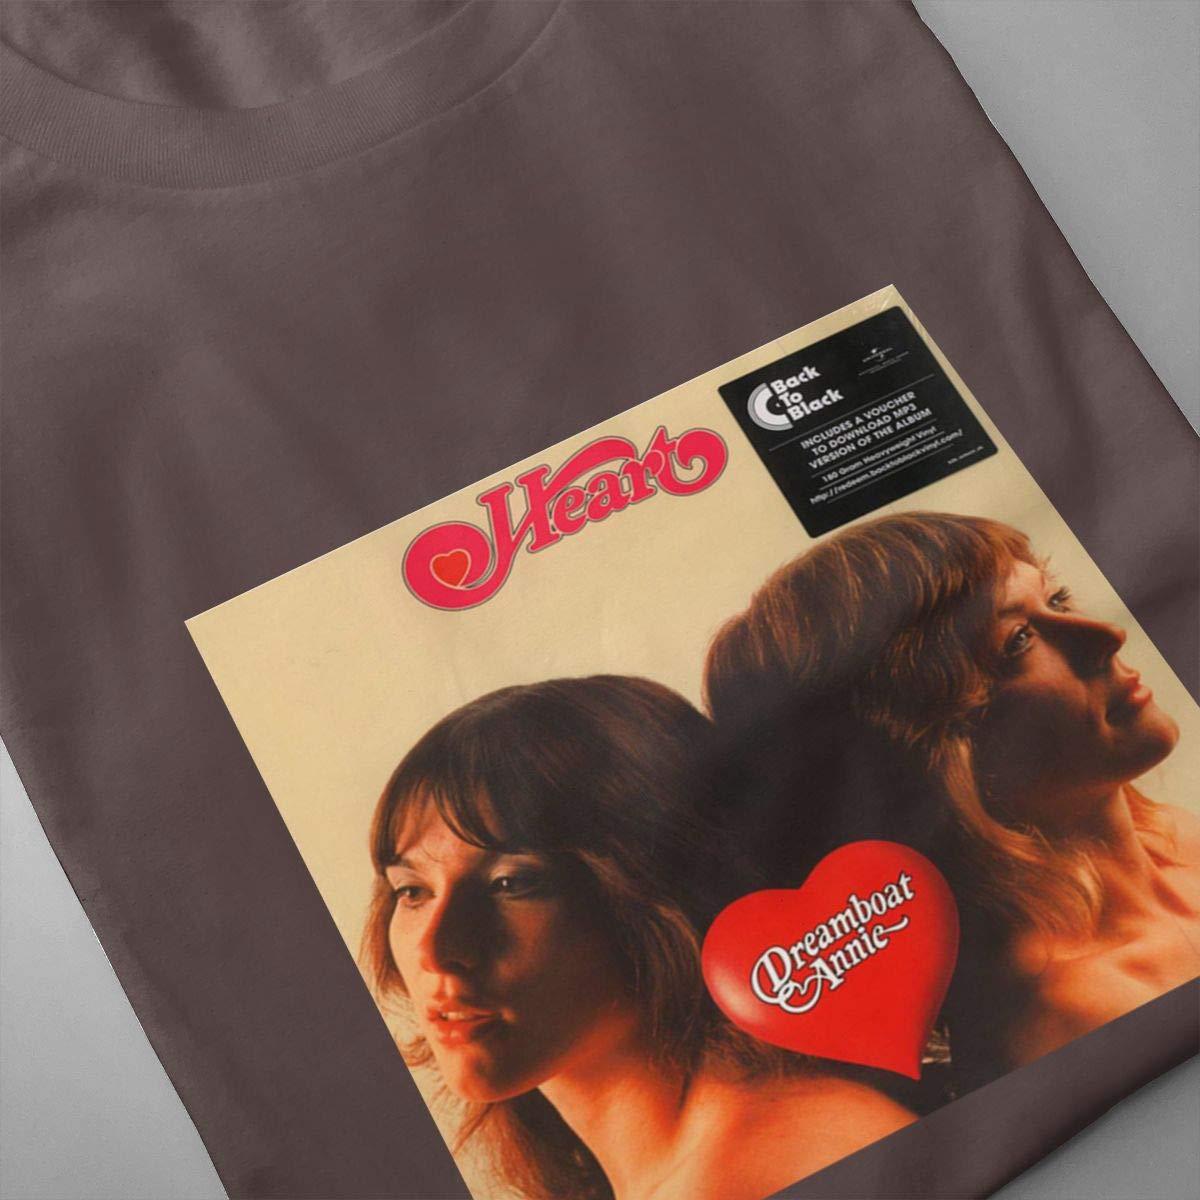 VIIHAHN Men Design Heart Dreamboat Annie Casual Outdoor Round Neck Short Sleeve T-Shirt